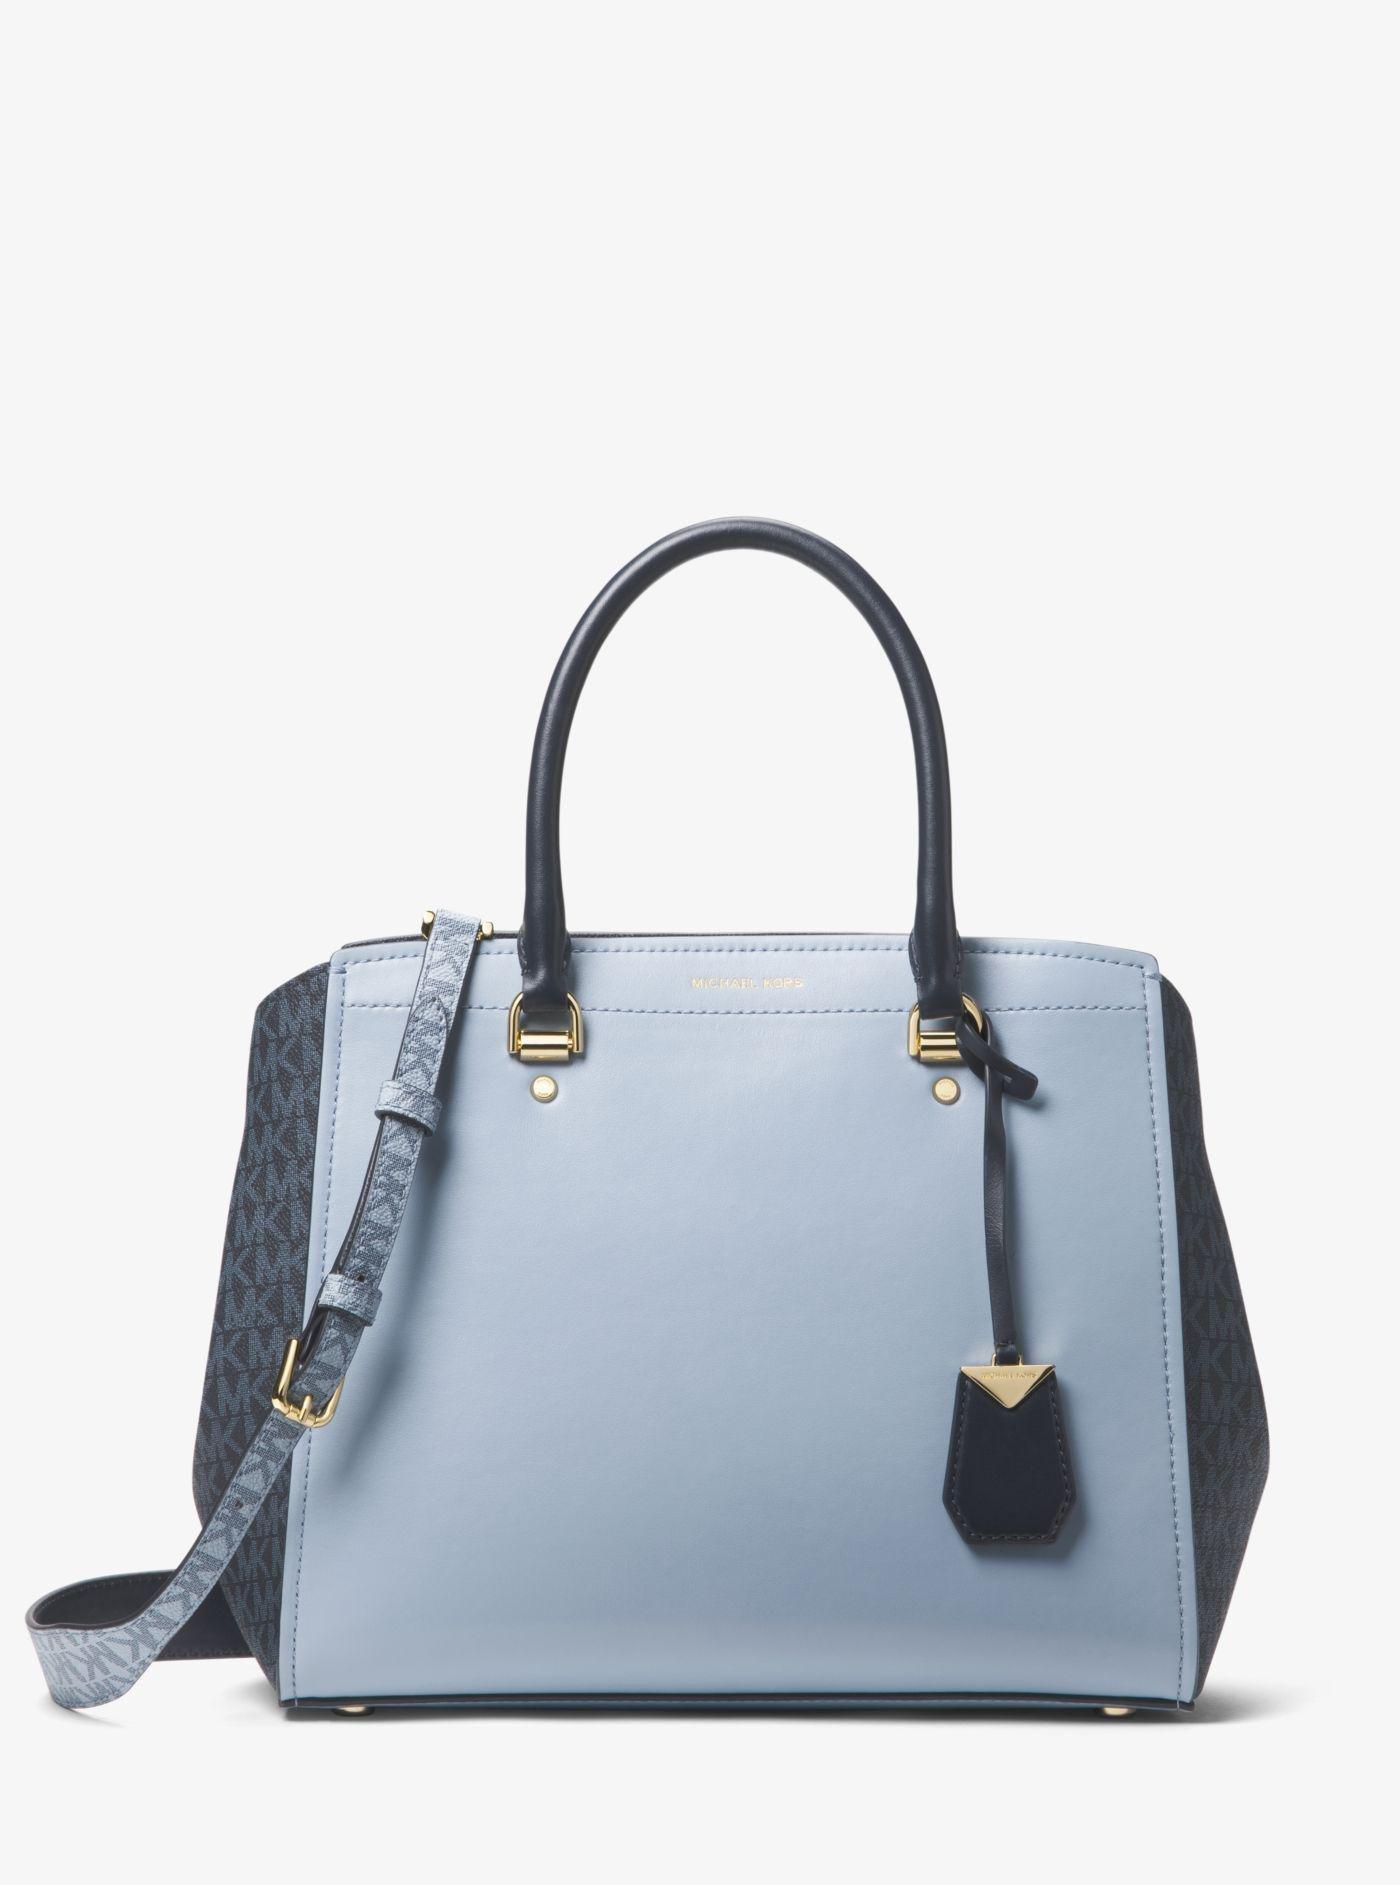 4cb8dcc76b9 ... bag truffle 6c8fd dbf8e purchase michael kors benning large leather and  logo satchel lyst 848b2 22bc1 ...